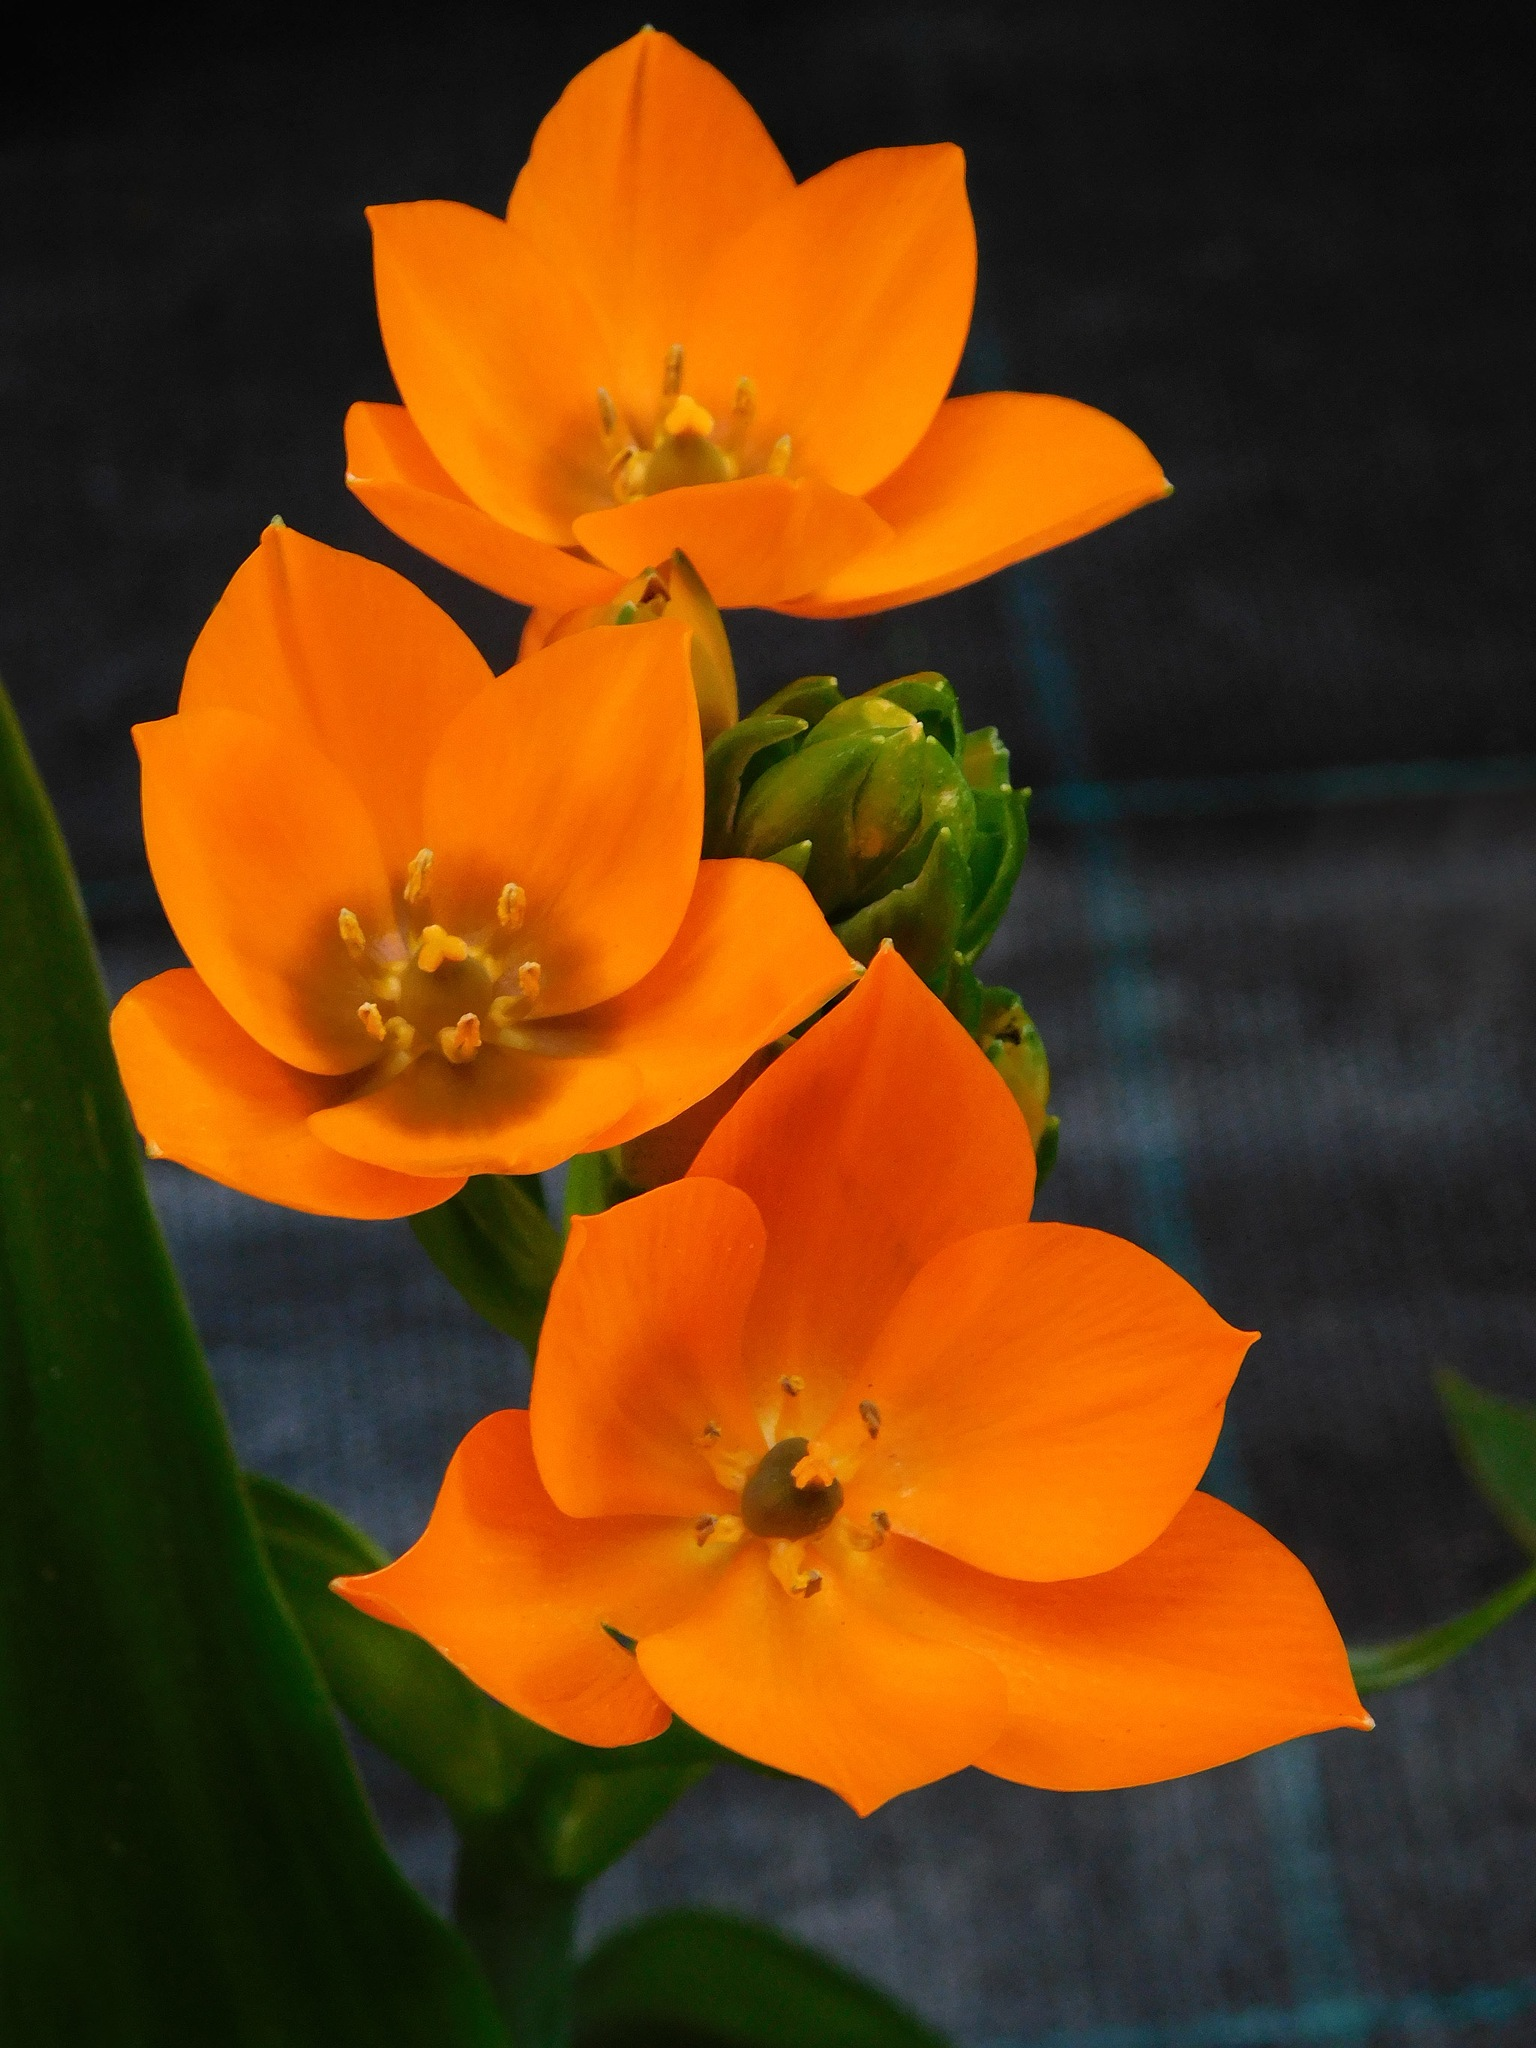 Orange flower by Nikolett Rostási